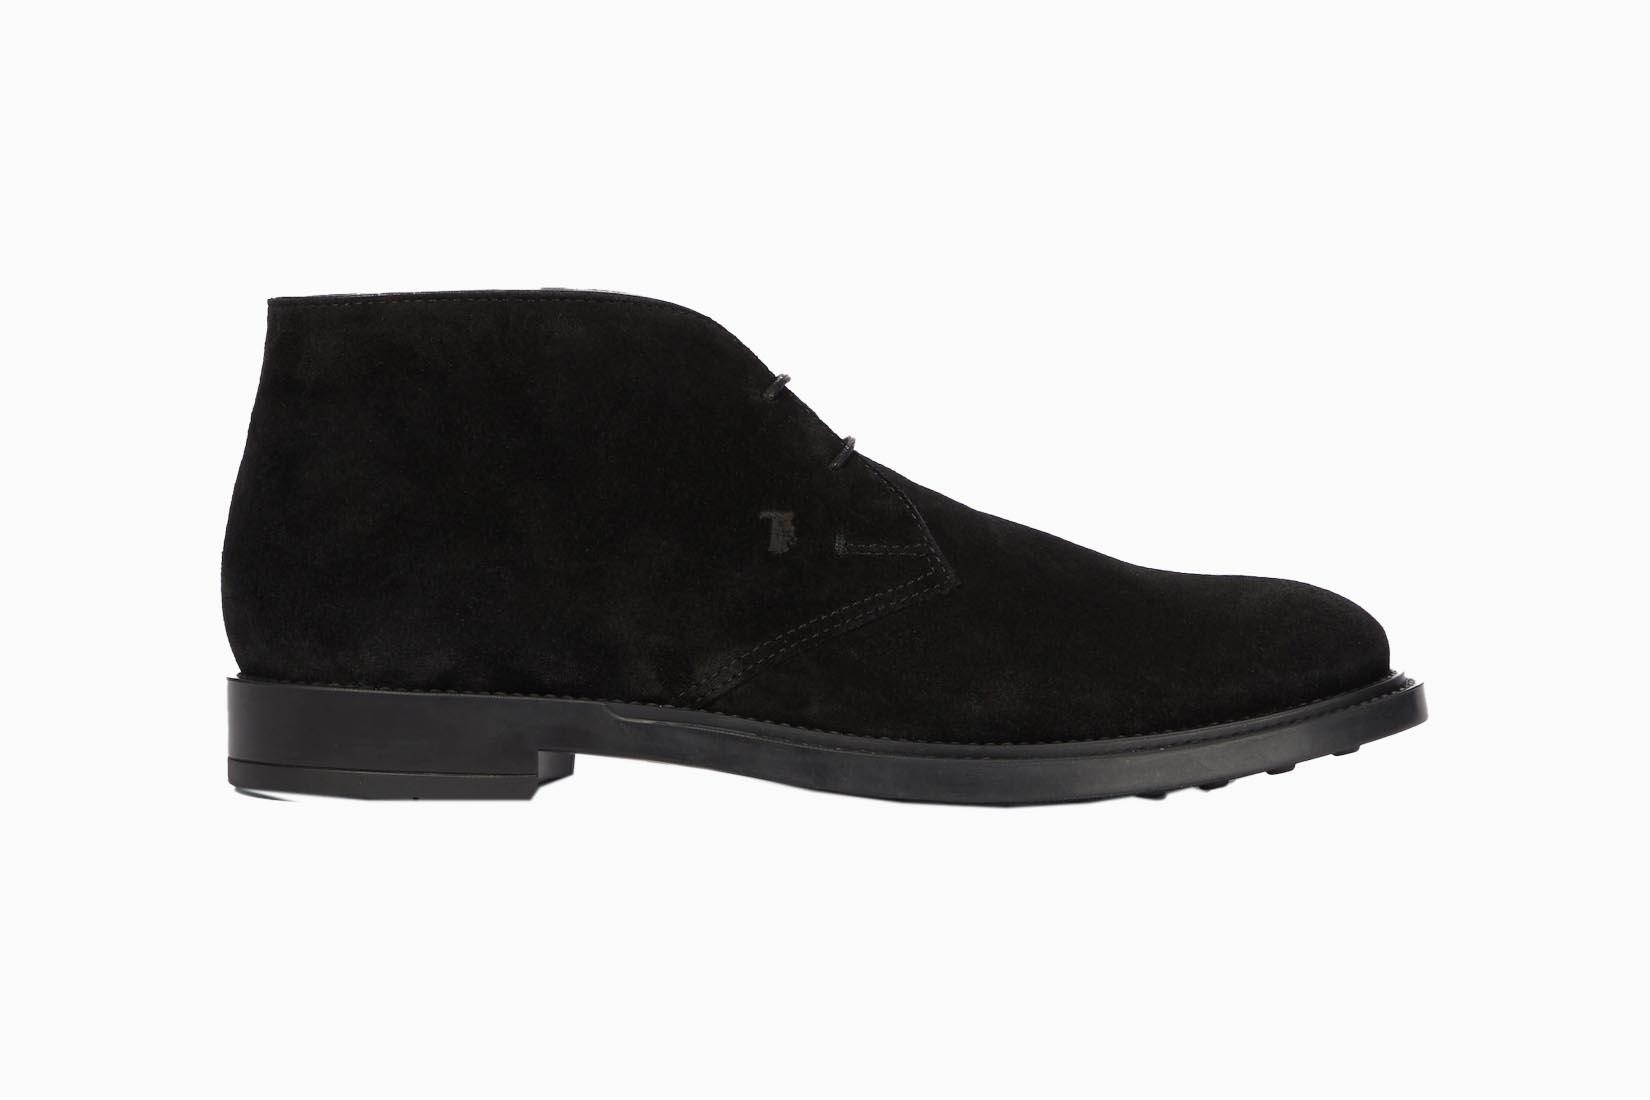 best boots men tods desert boots review Luxe Digital